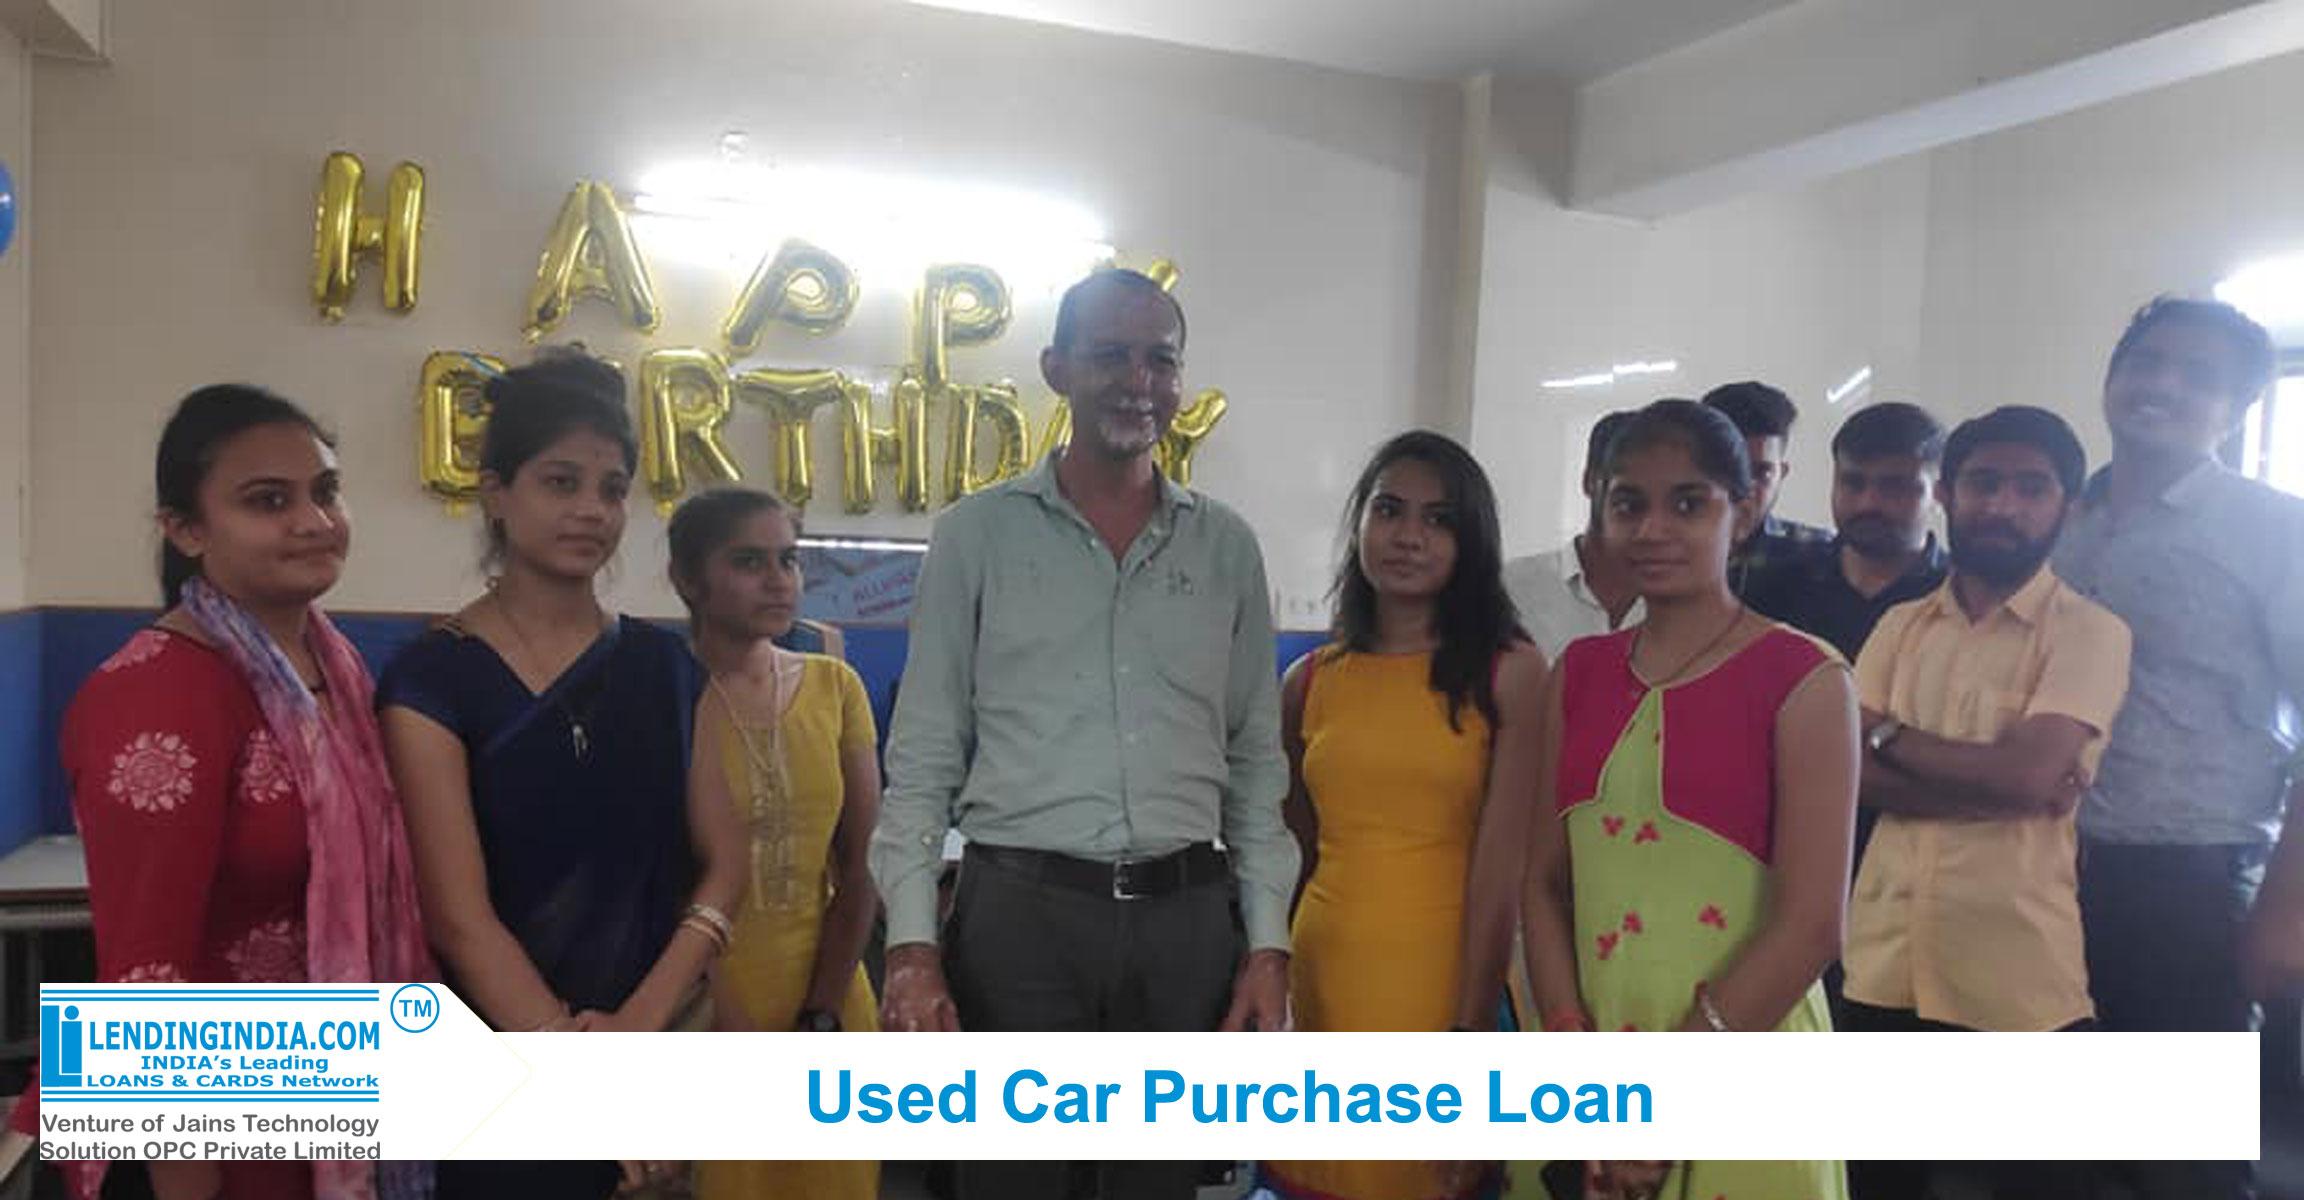 lending india used car purchase loan